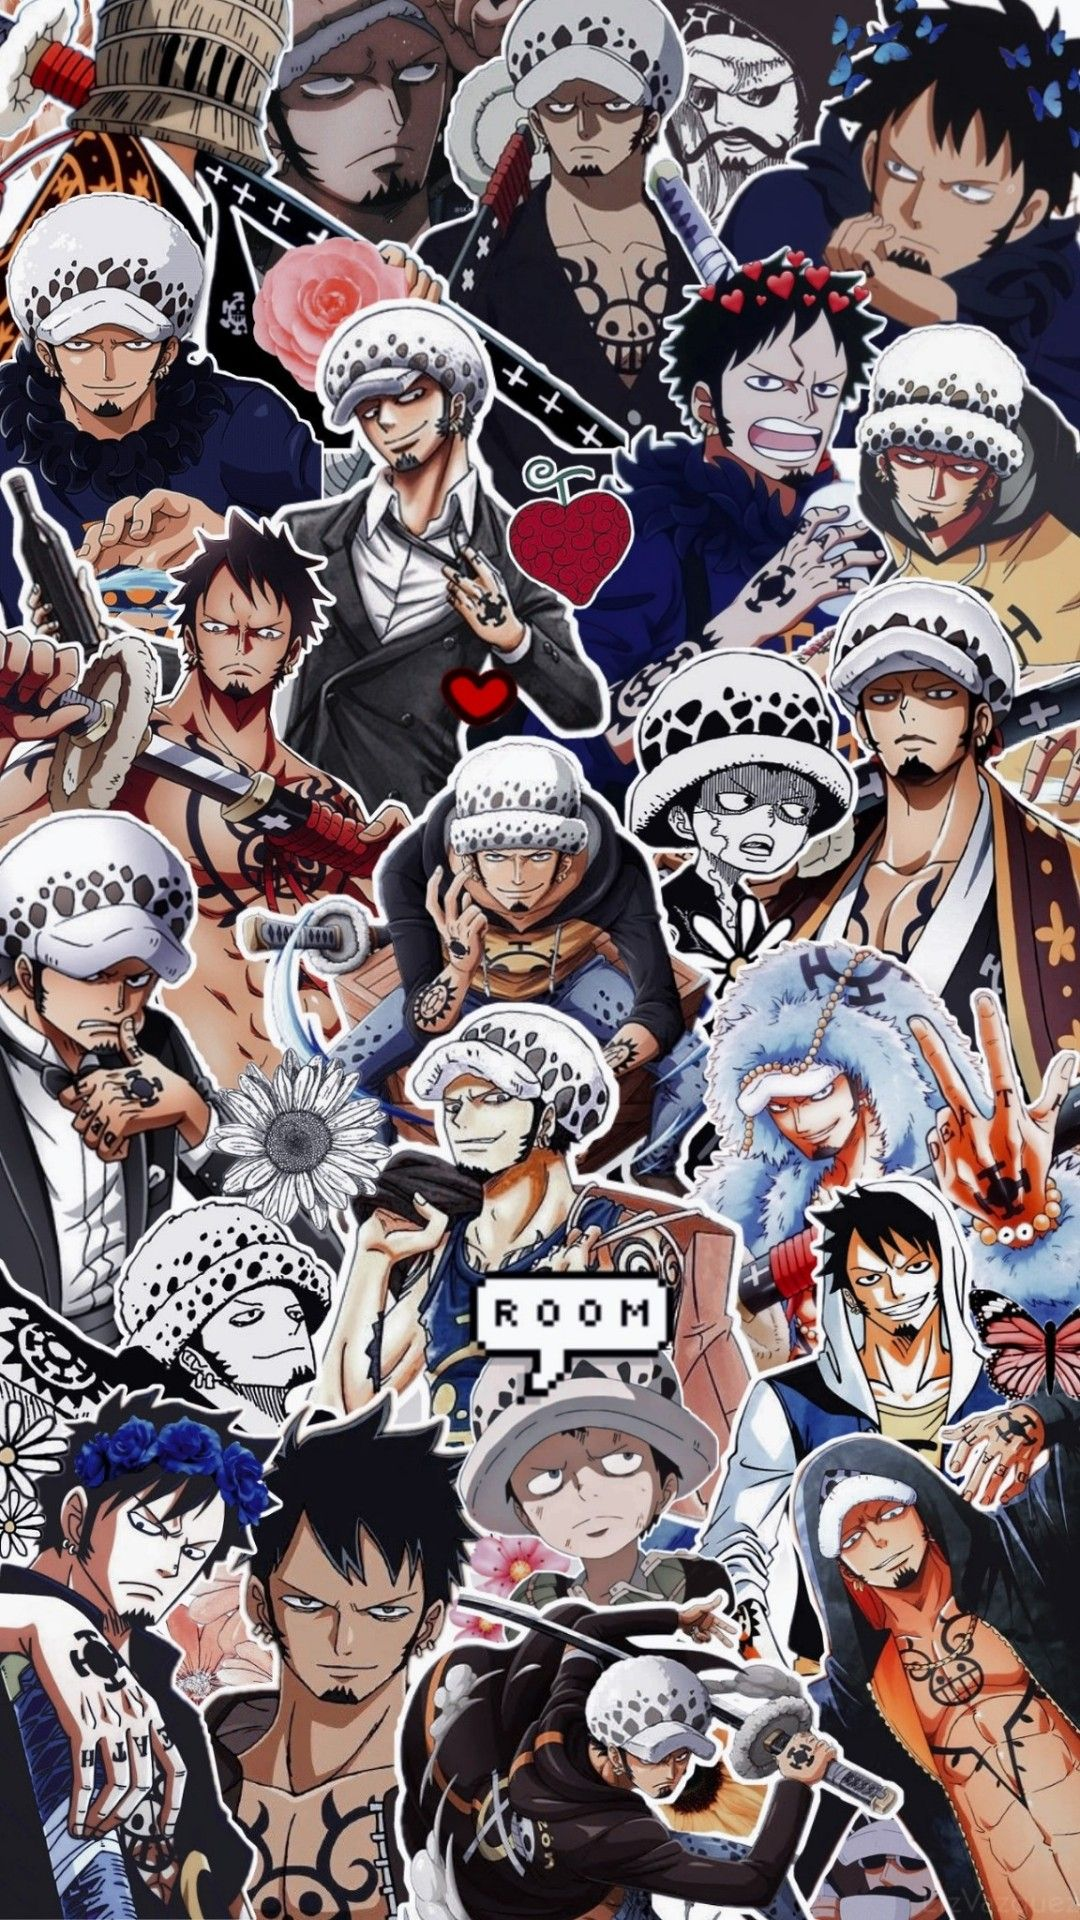 Liz Vazquez One Piece Wallpapers Vintage 1288px X 2289px Manga Anime One Piece One Piece Wallpaper Iphone One Piece Comic